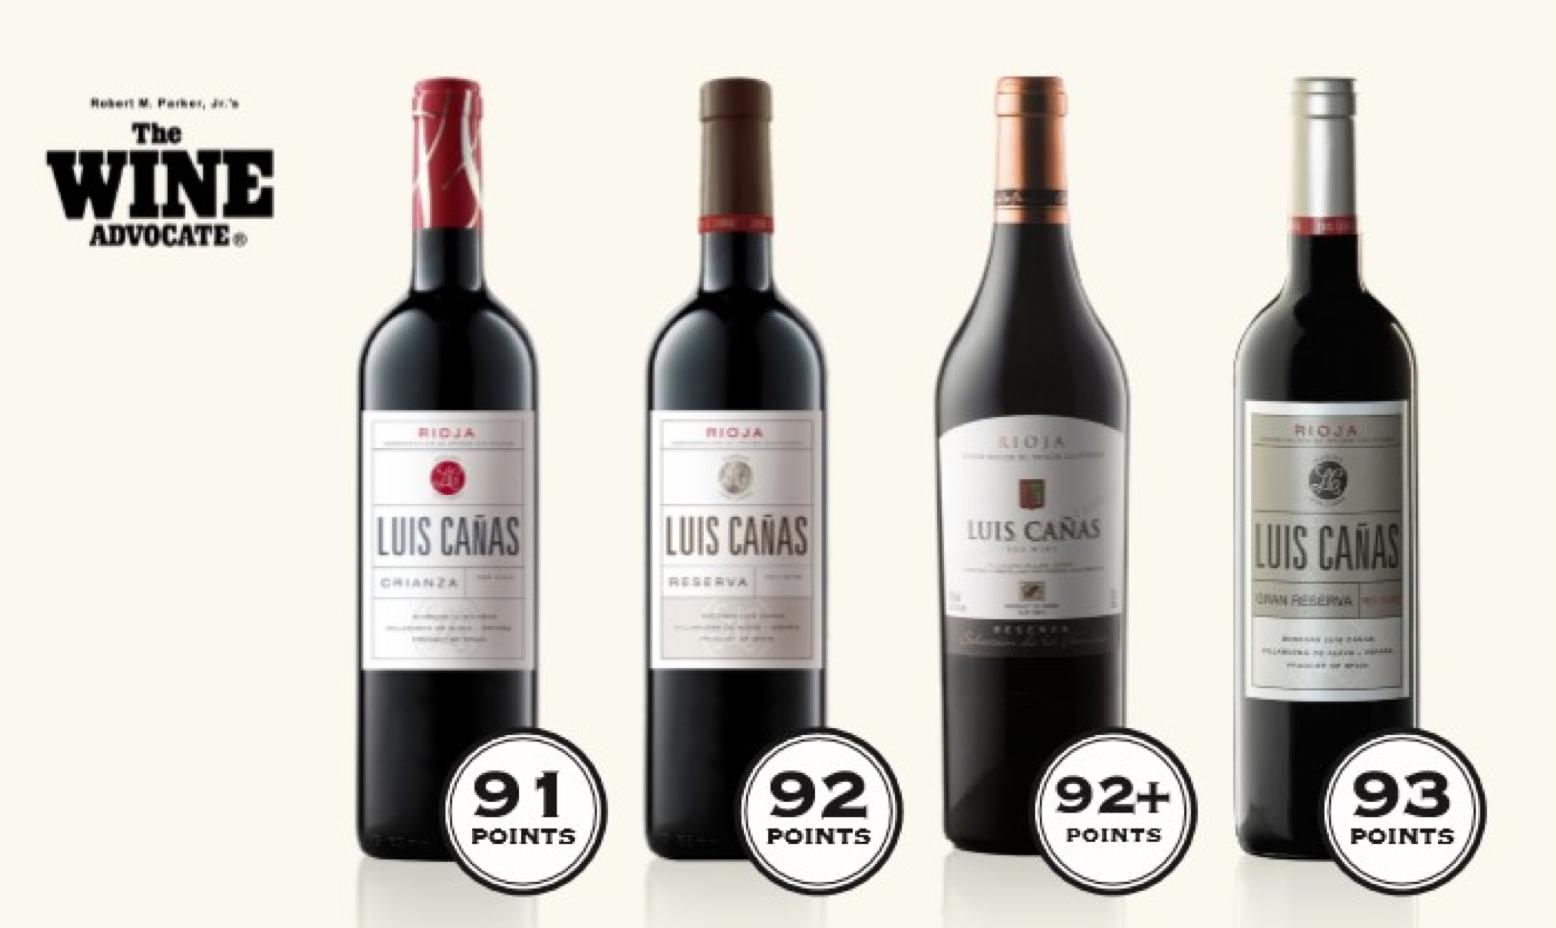 Wijnen Luis Canas